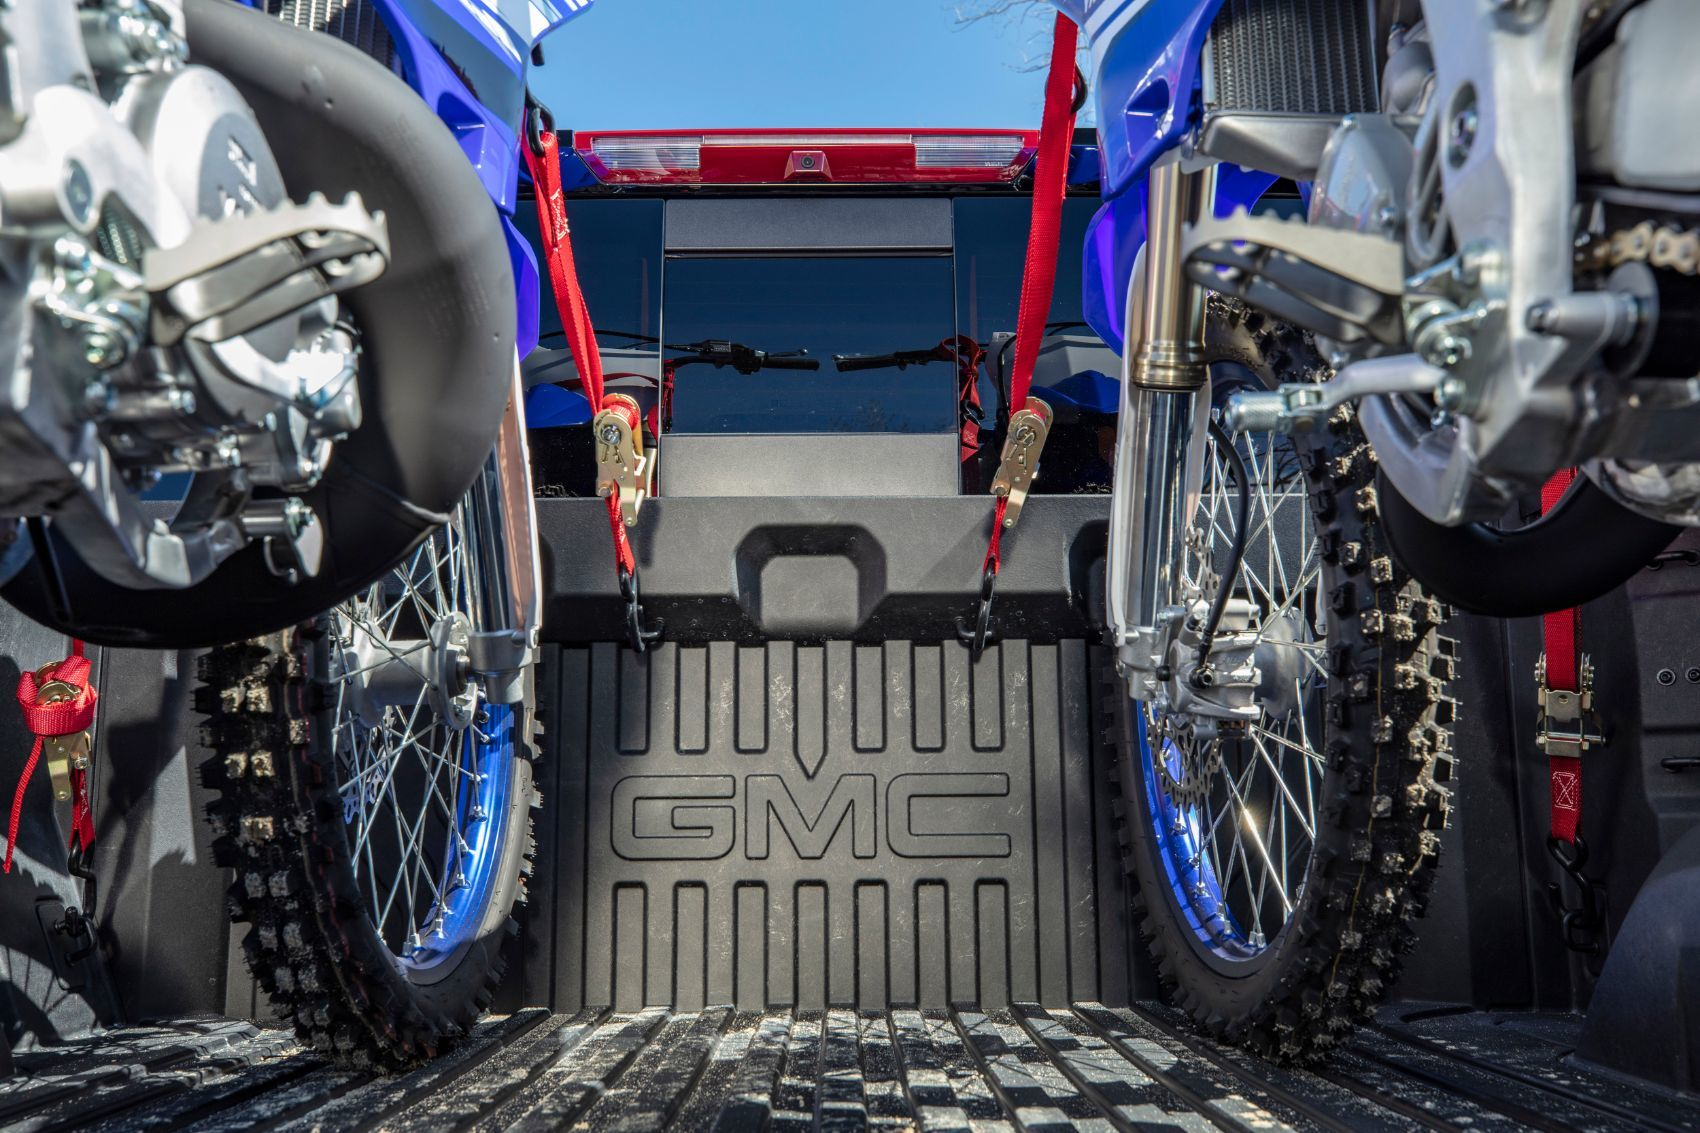 2019 GMC Sierra Denali CarbonPro Edition 165